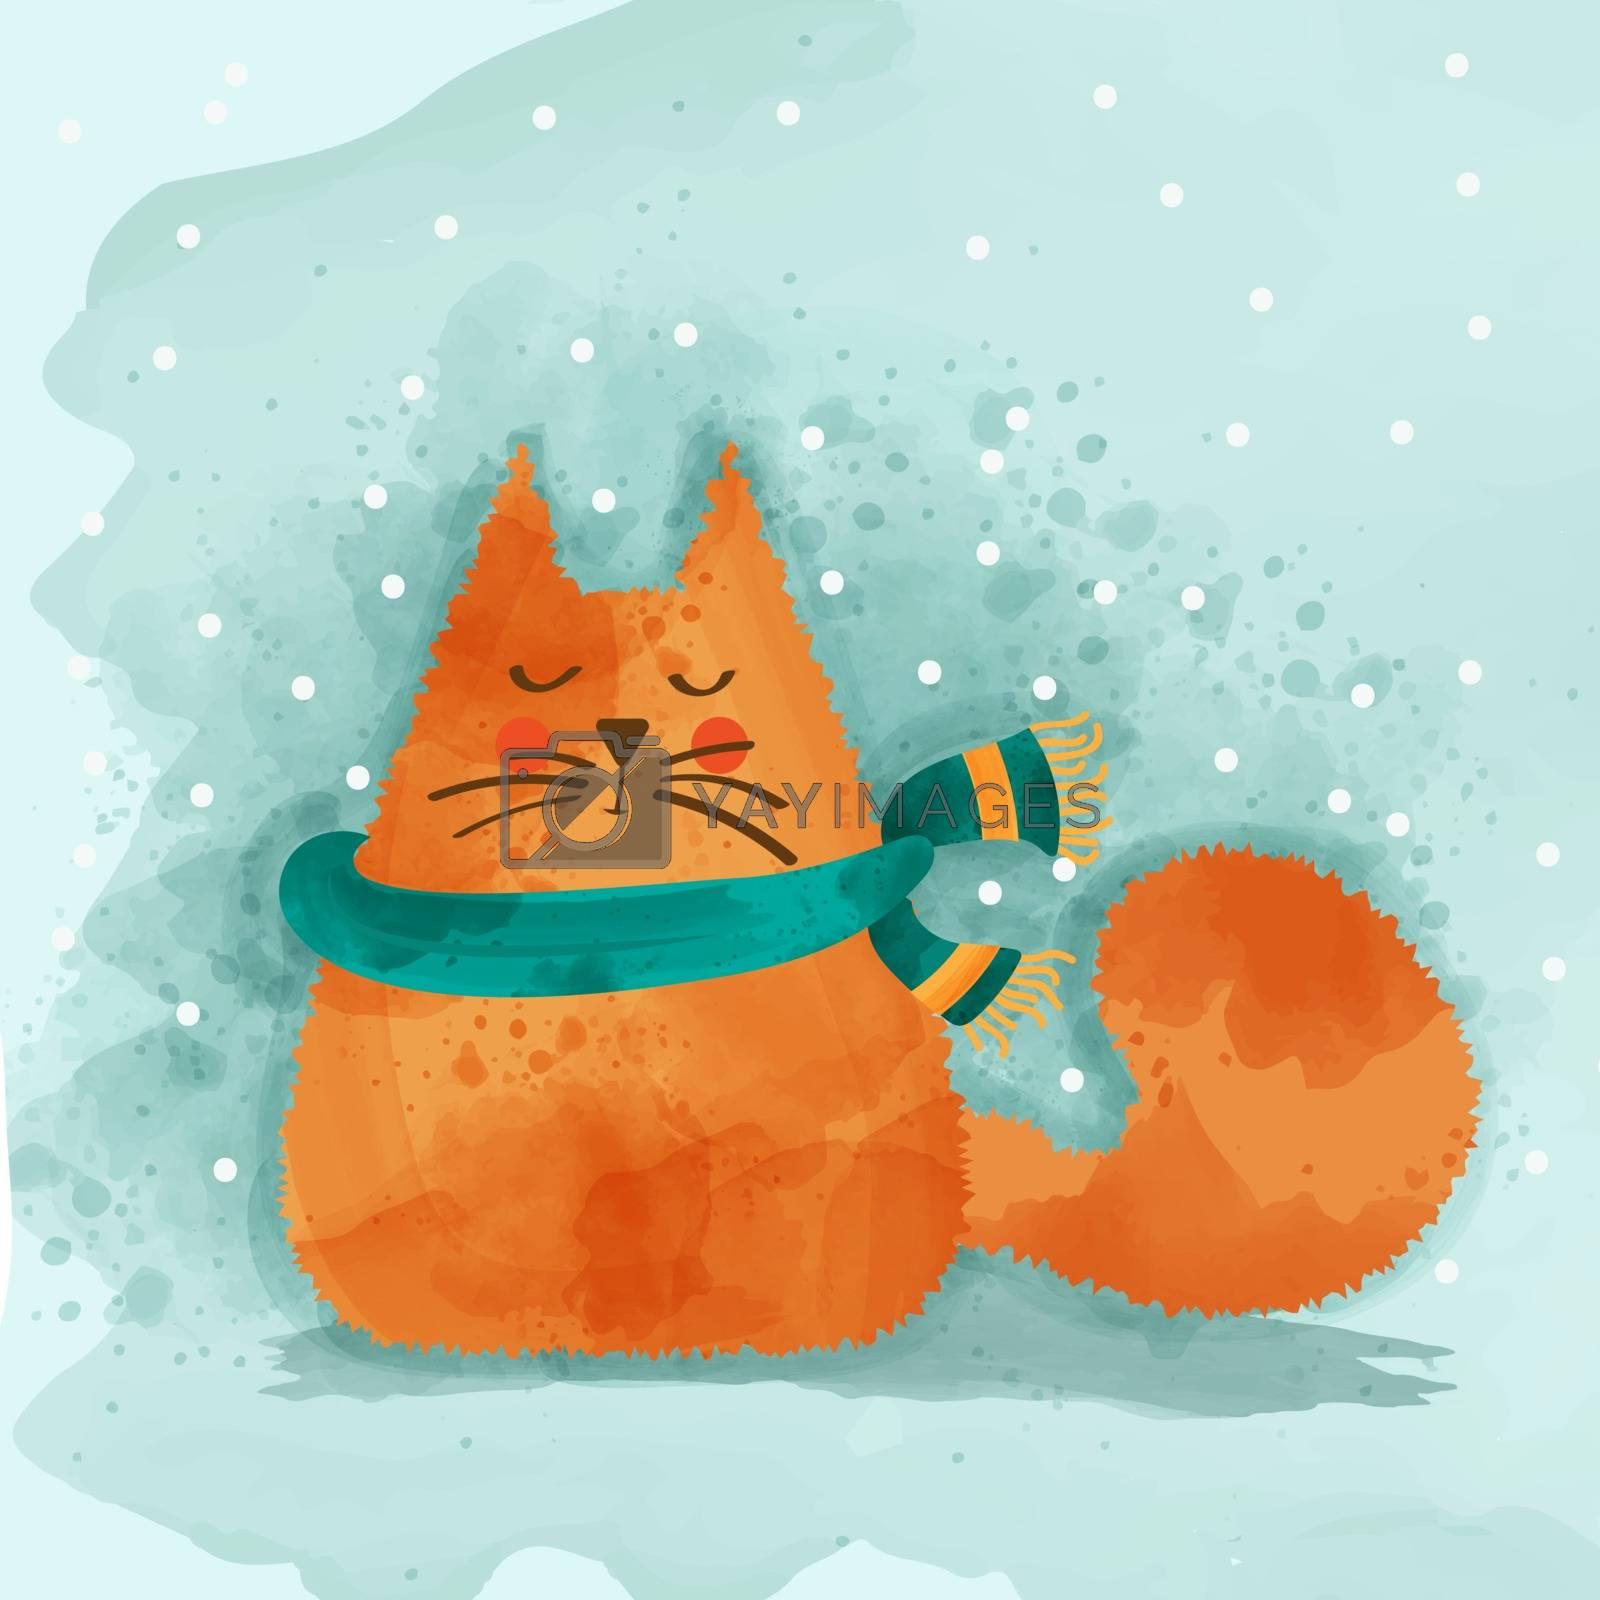 Cute watercolor cat in winter. Christmas card. Vector